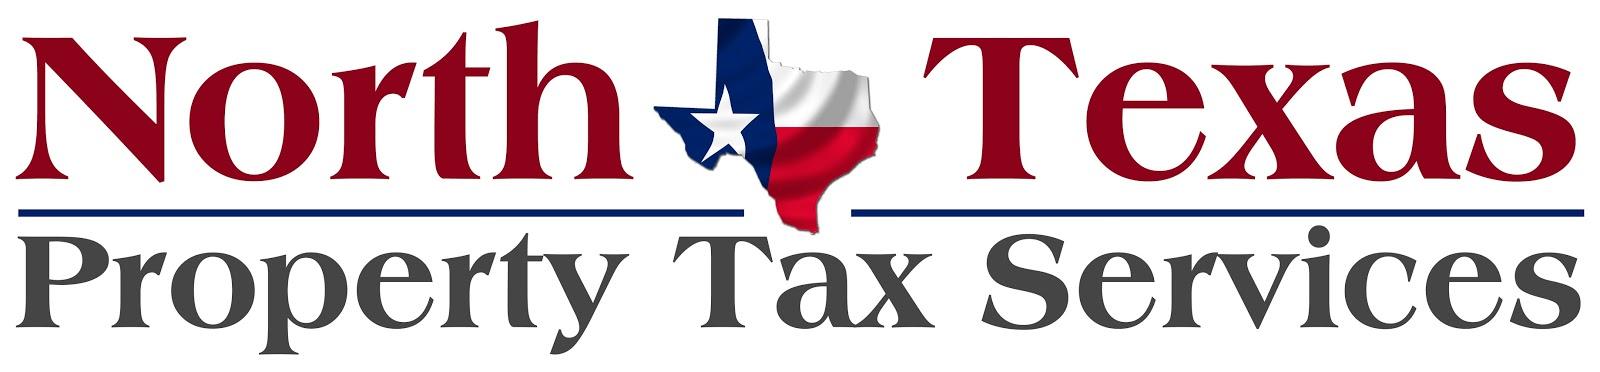 How Protest Taxes Property Denton